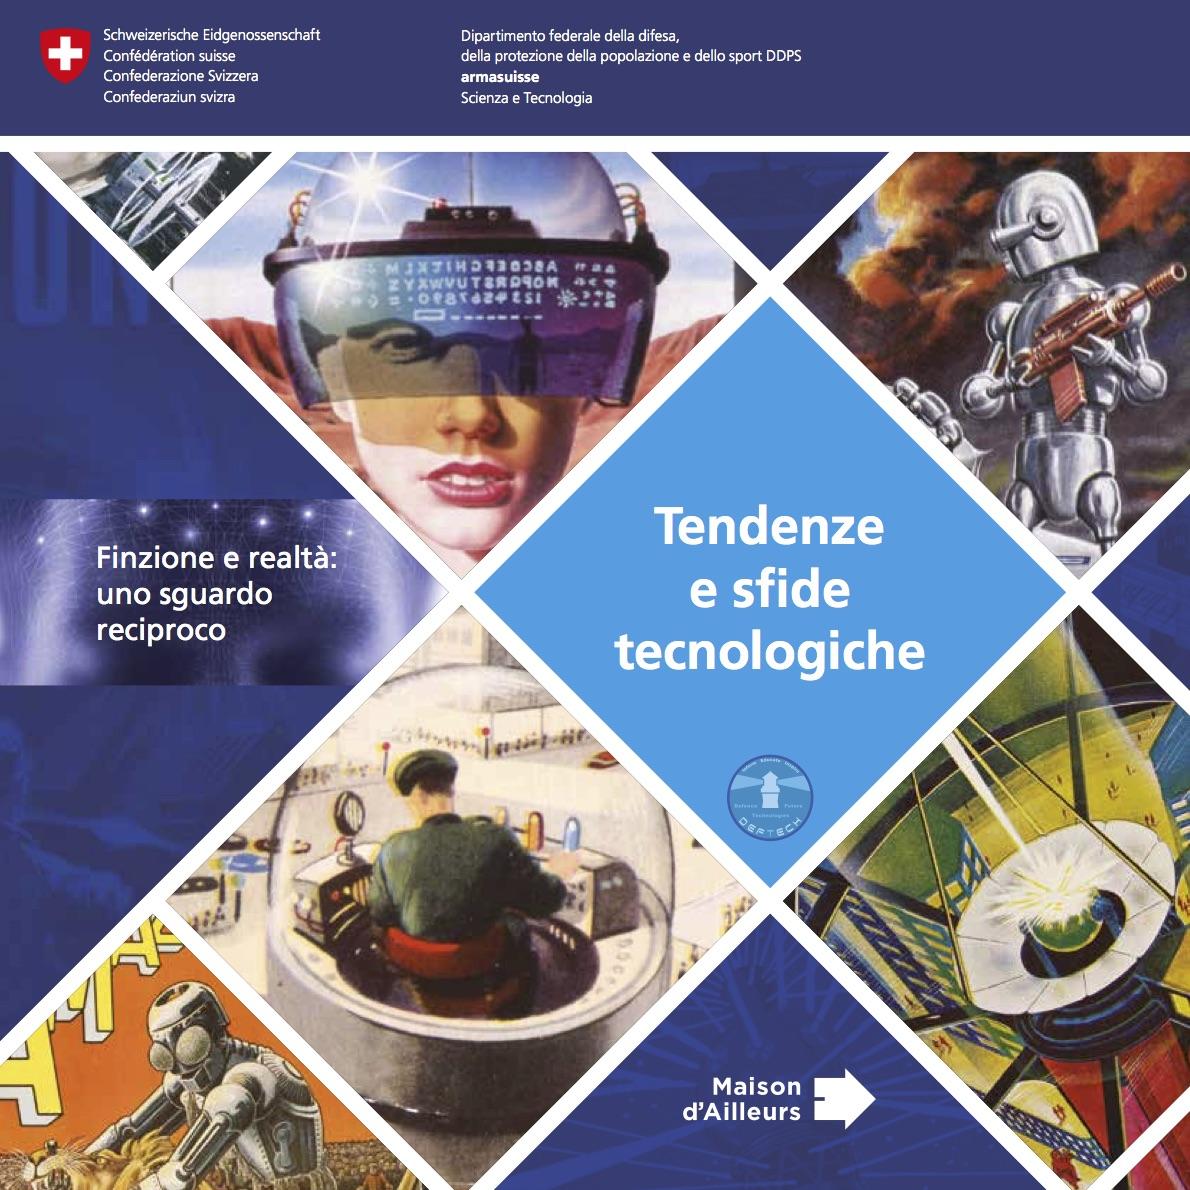 Tendenze-e-sfide-technologiche-armasuisse-S+T-DEFTECH-2018